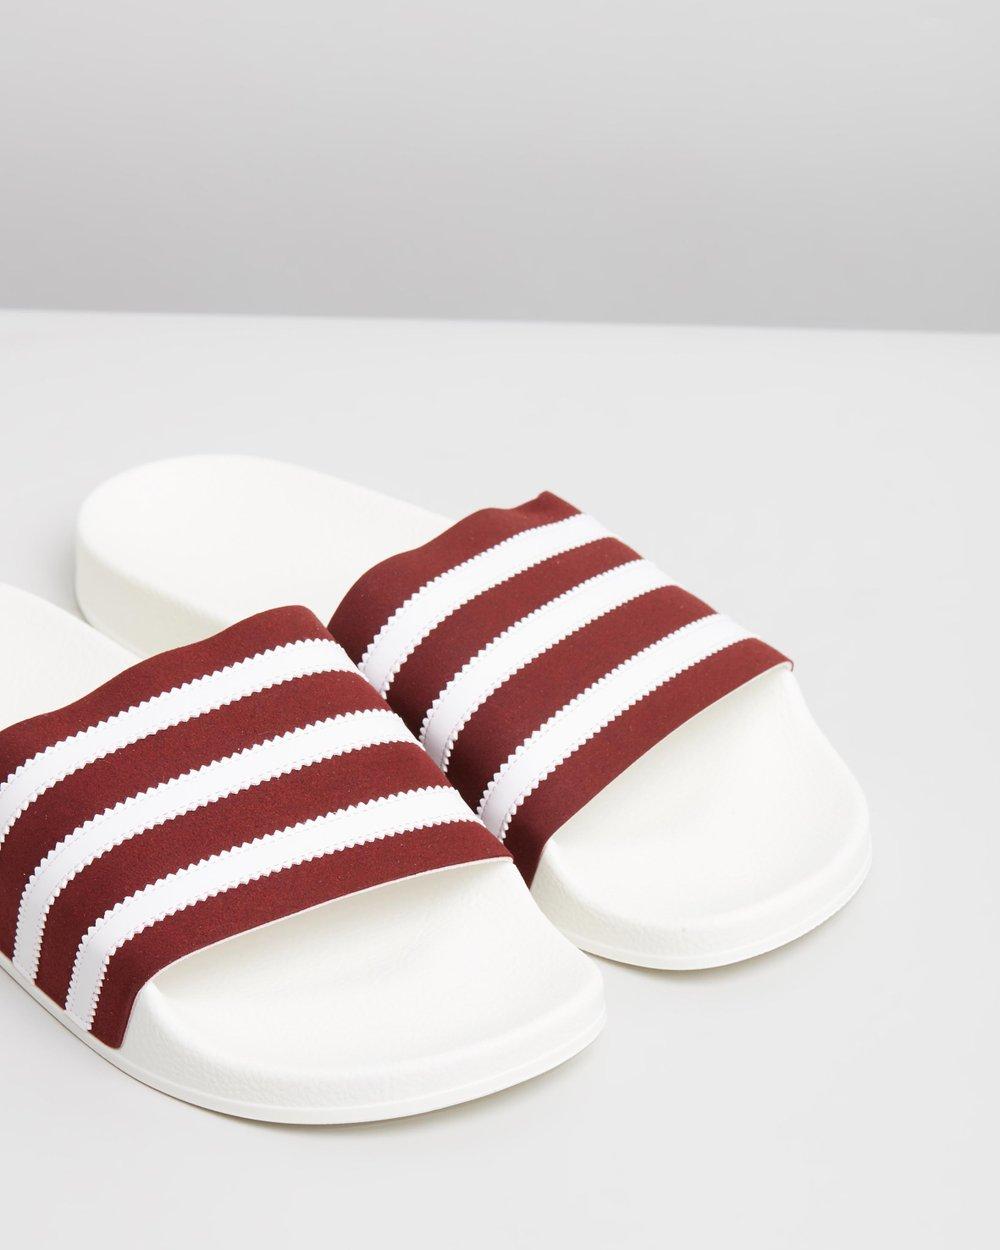 8baebda98 Adilette - Unisex by adidas Originals Online | THE ICONIC | Australia